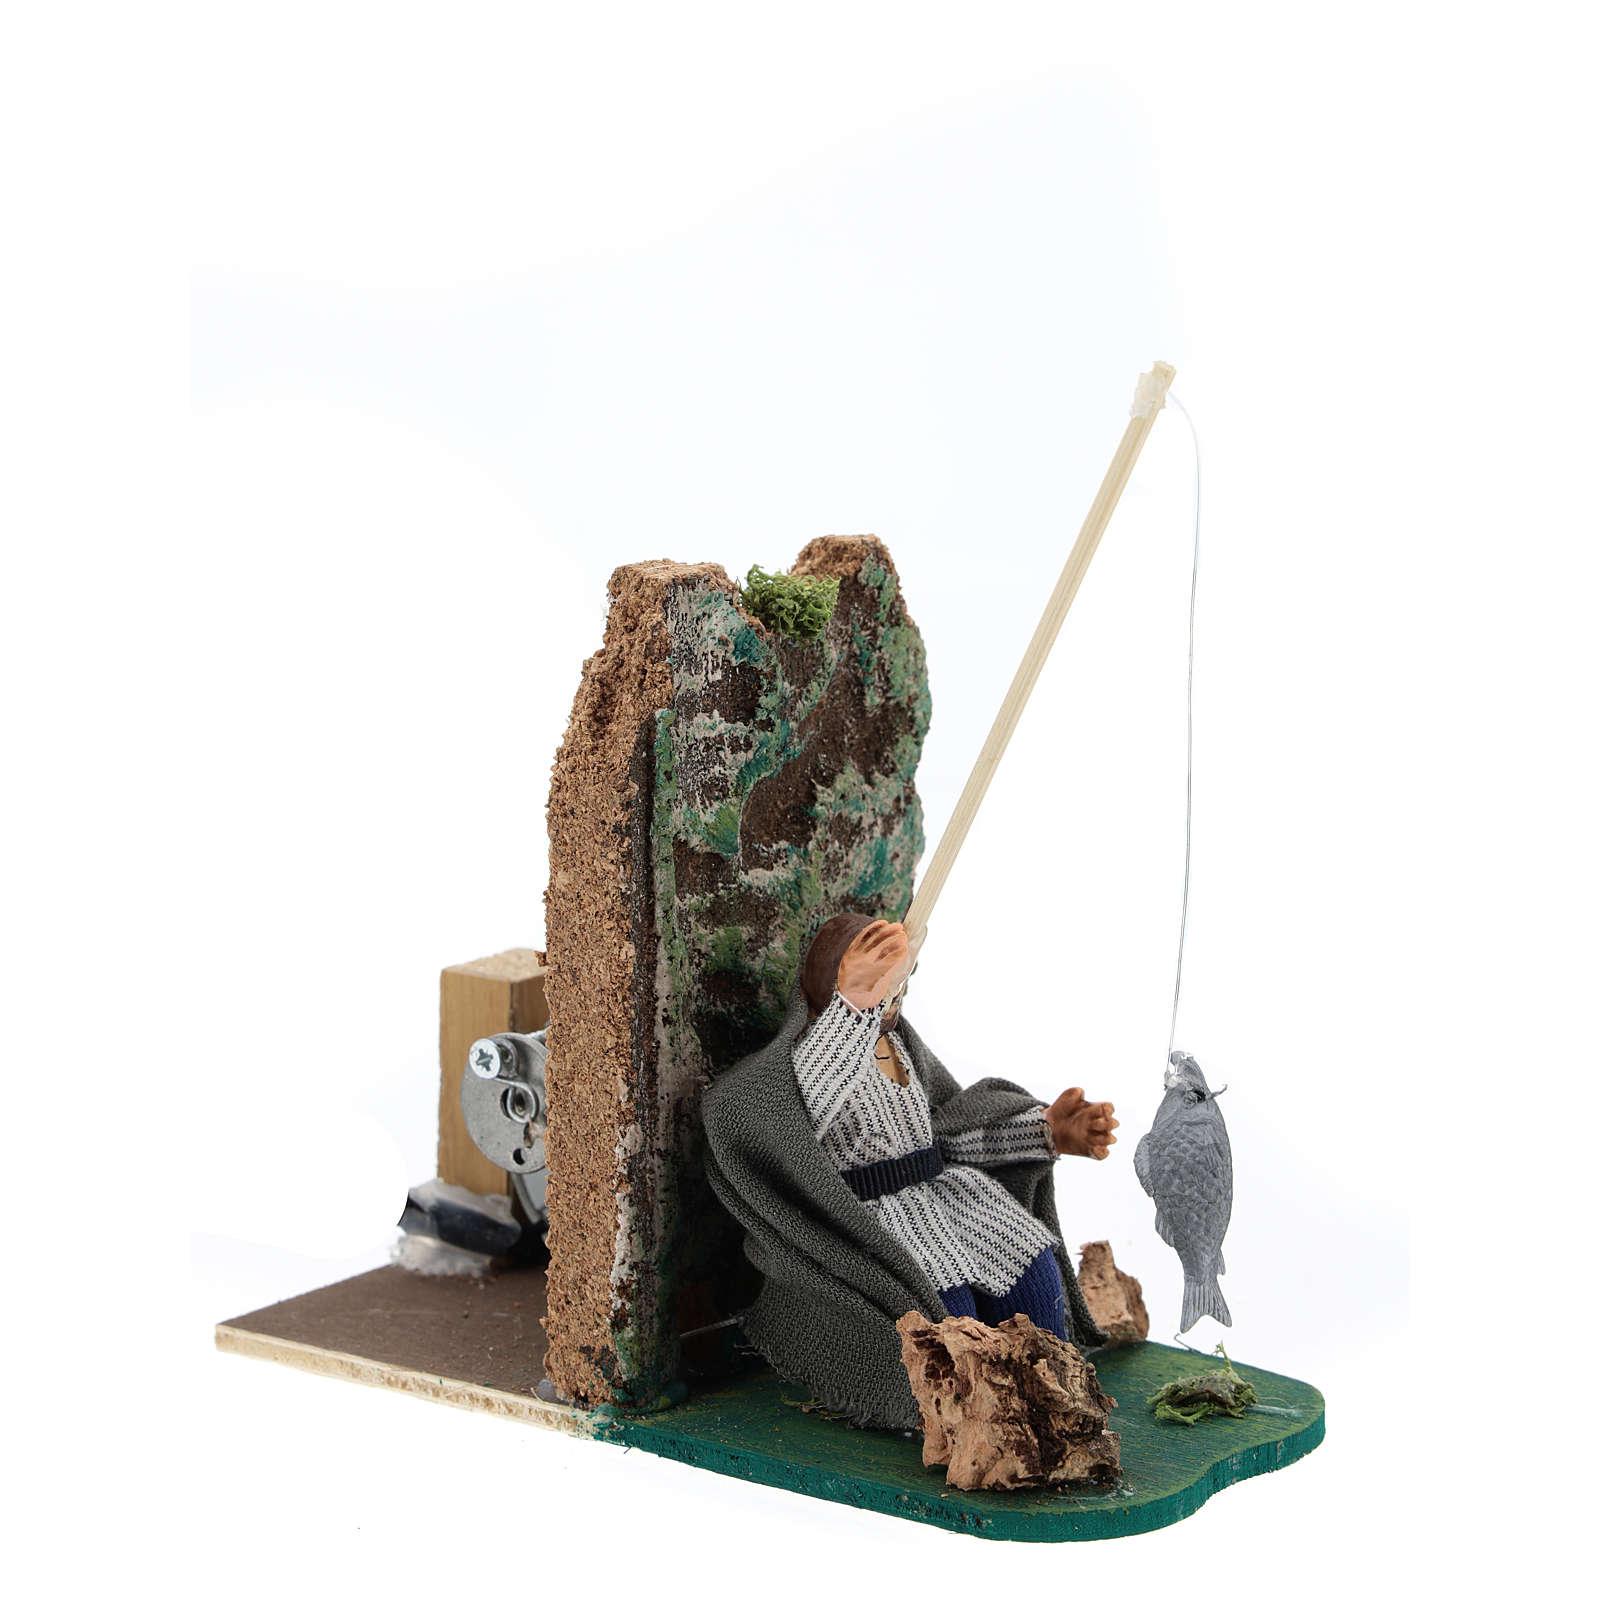 Pescador belén napolitano movimiento 7 cm 4